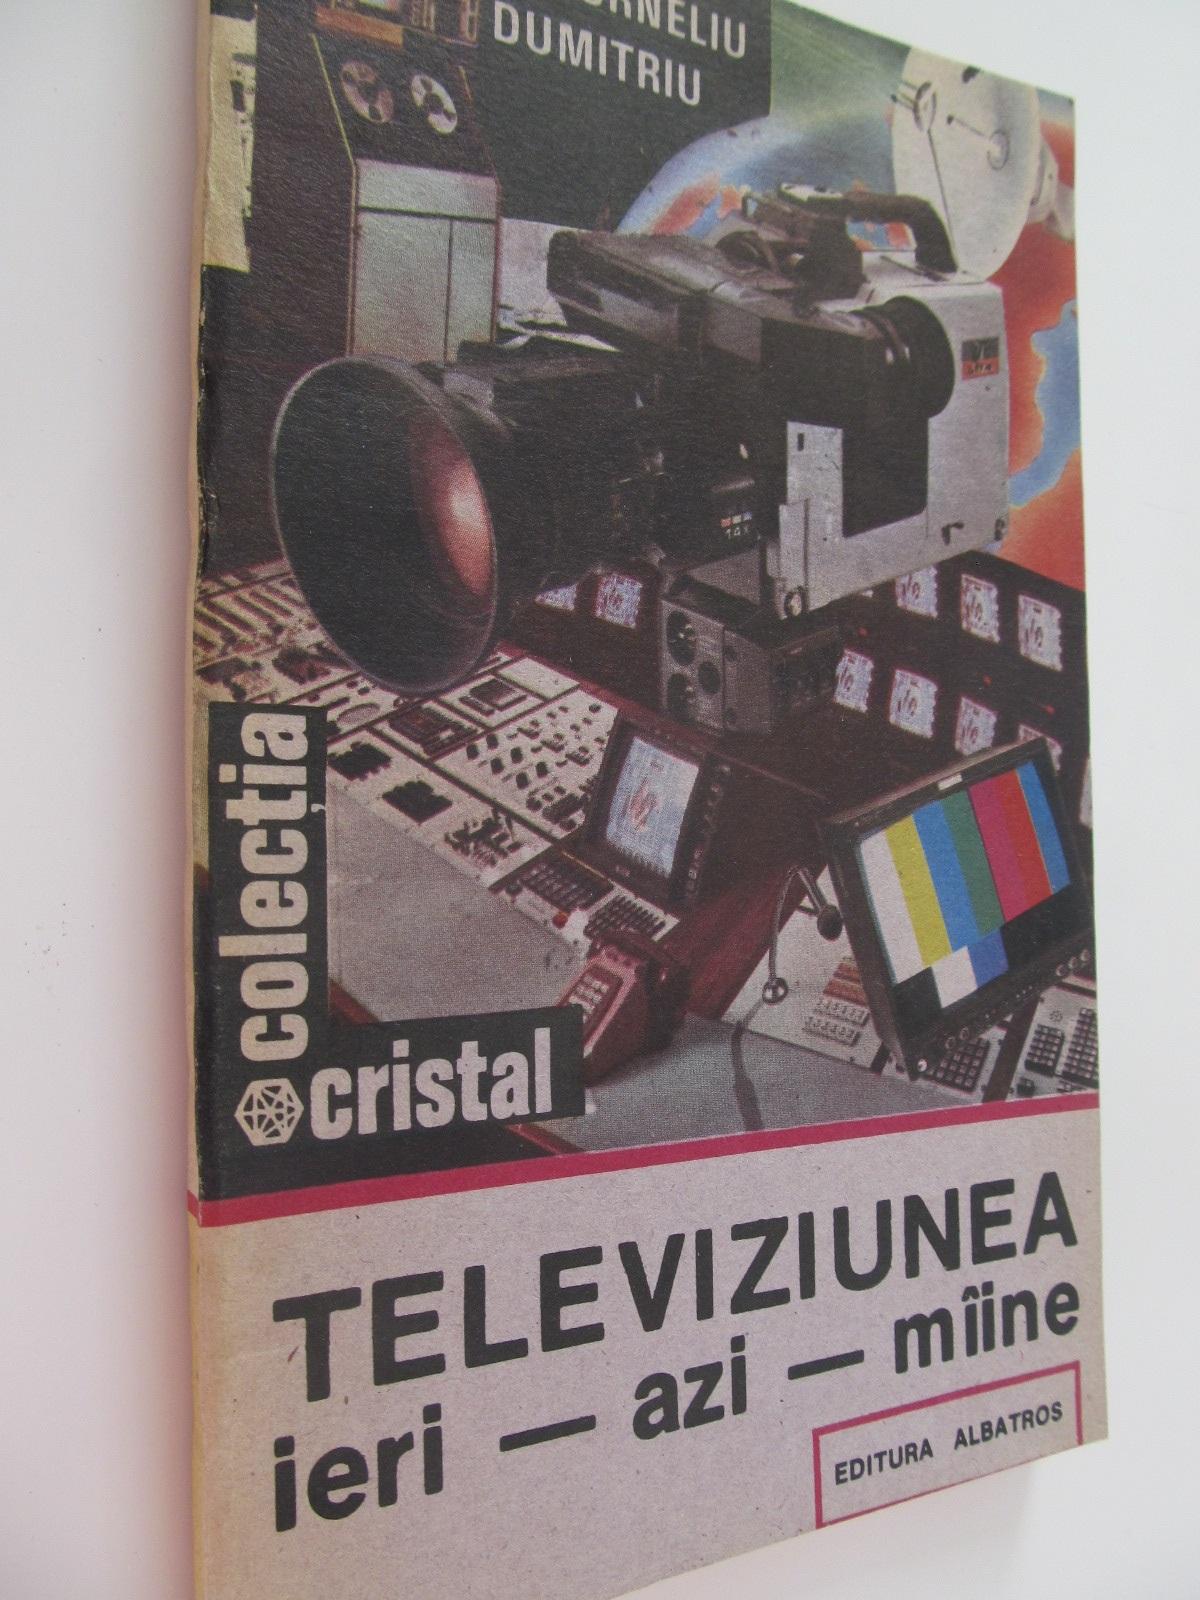 Televiziunea ieri azi maine - Puiu Corneliu Dumitru | Detalii carte